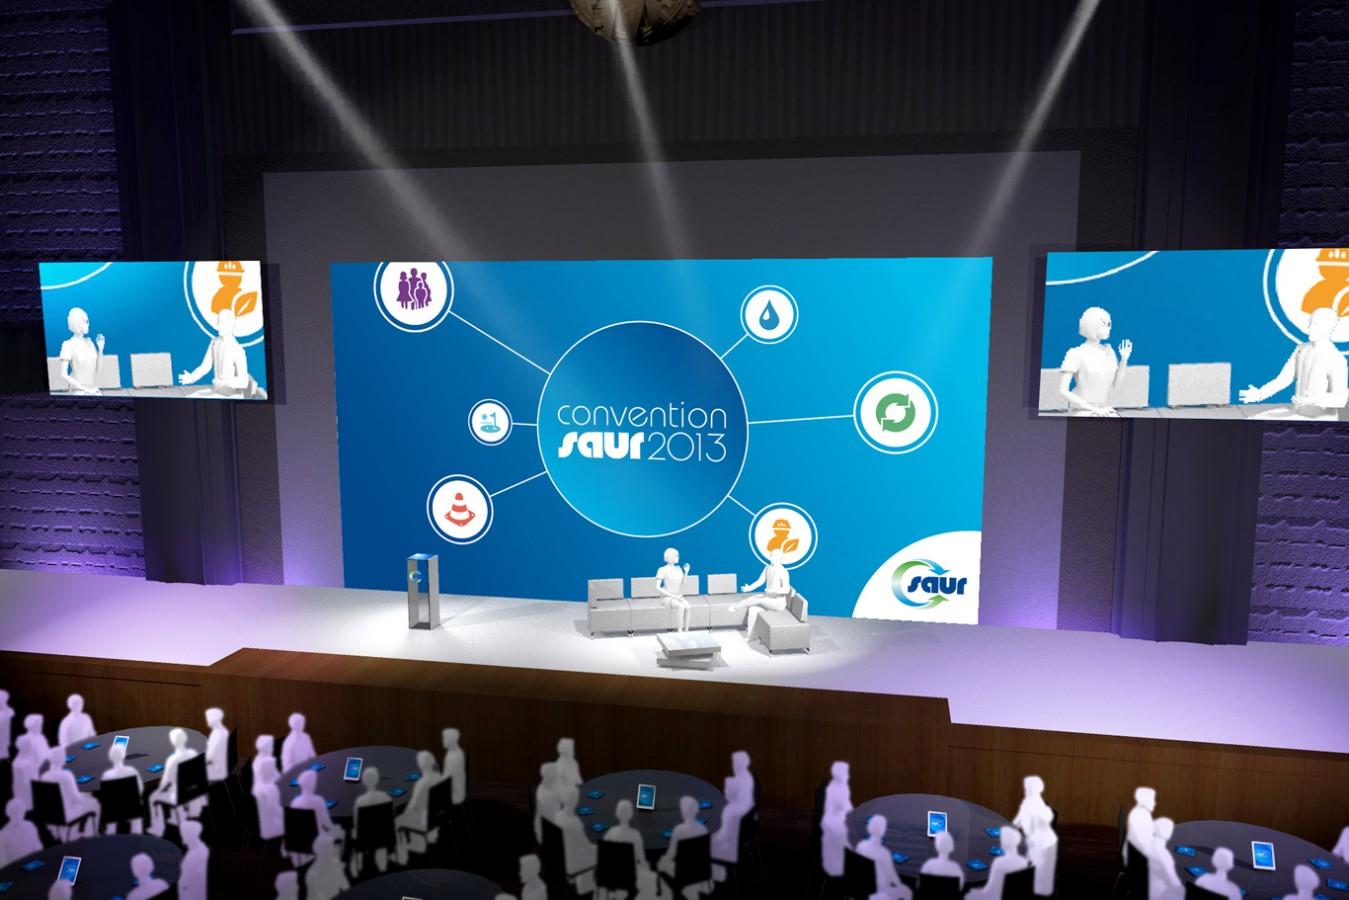 SAUR - Convention - 2013 - Agence : HavasEvent